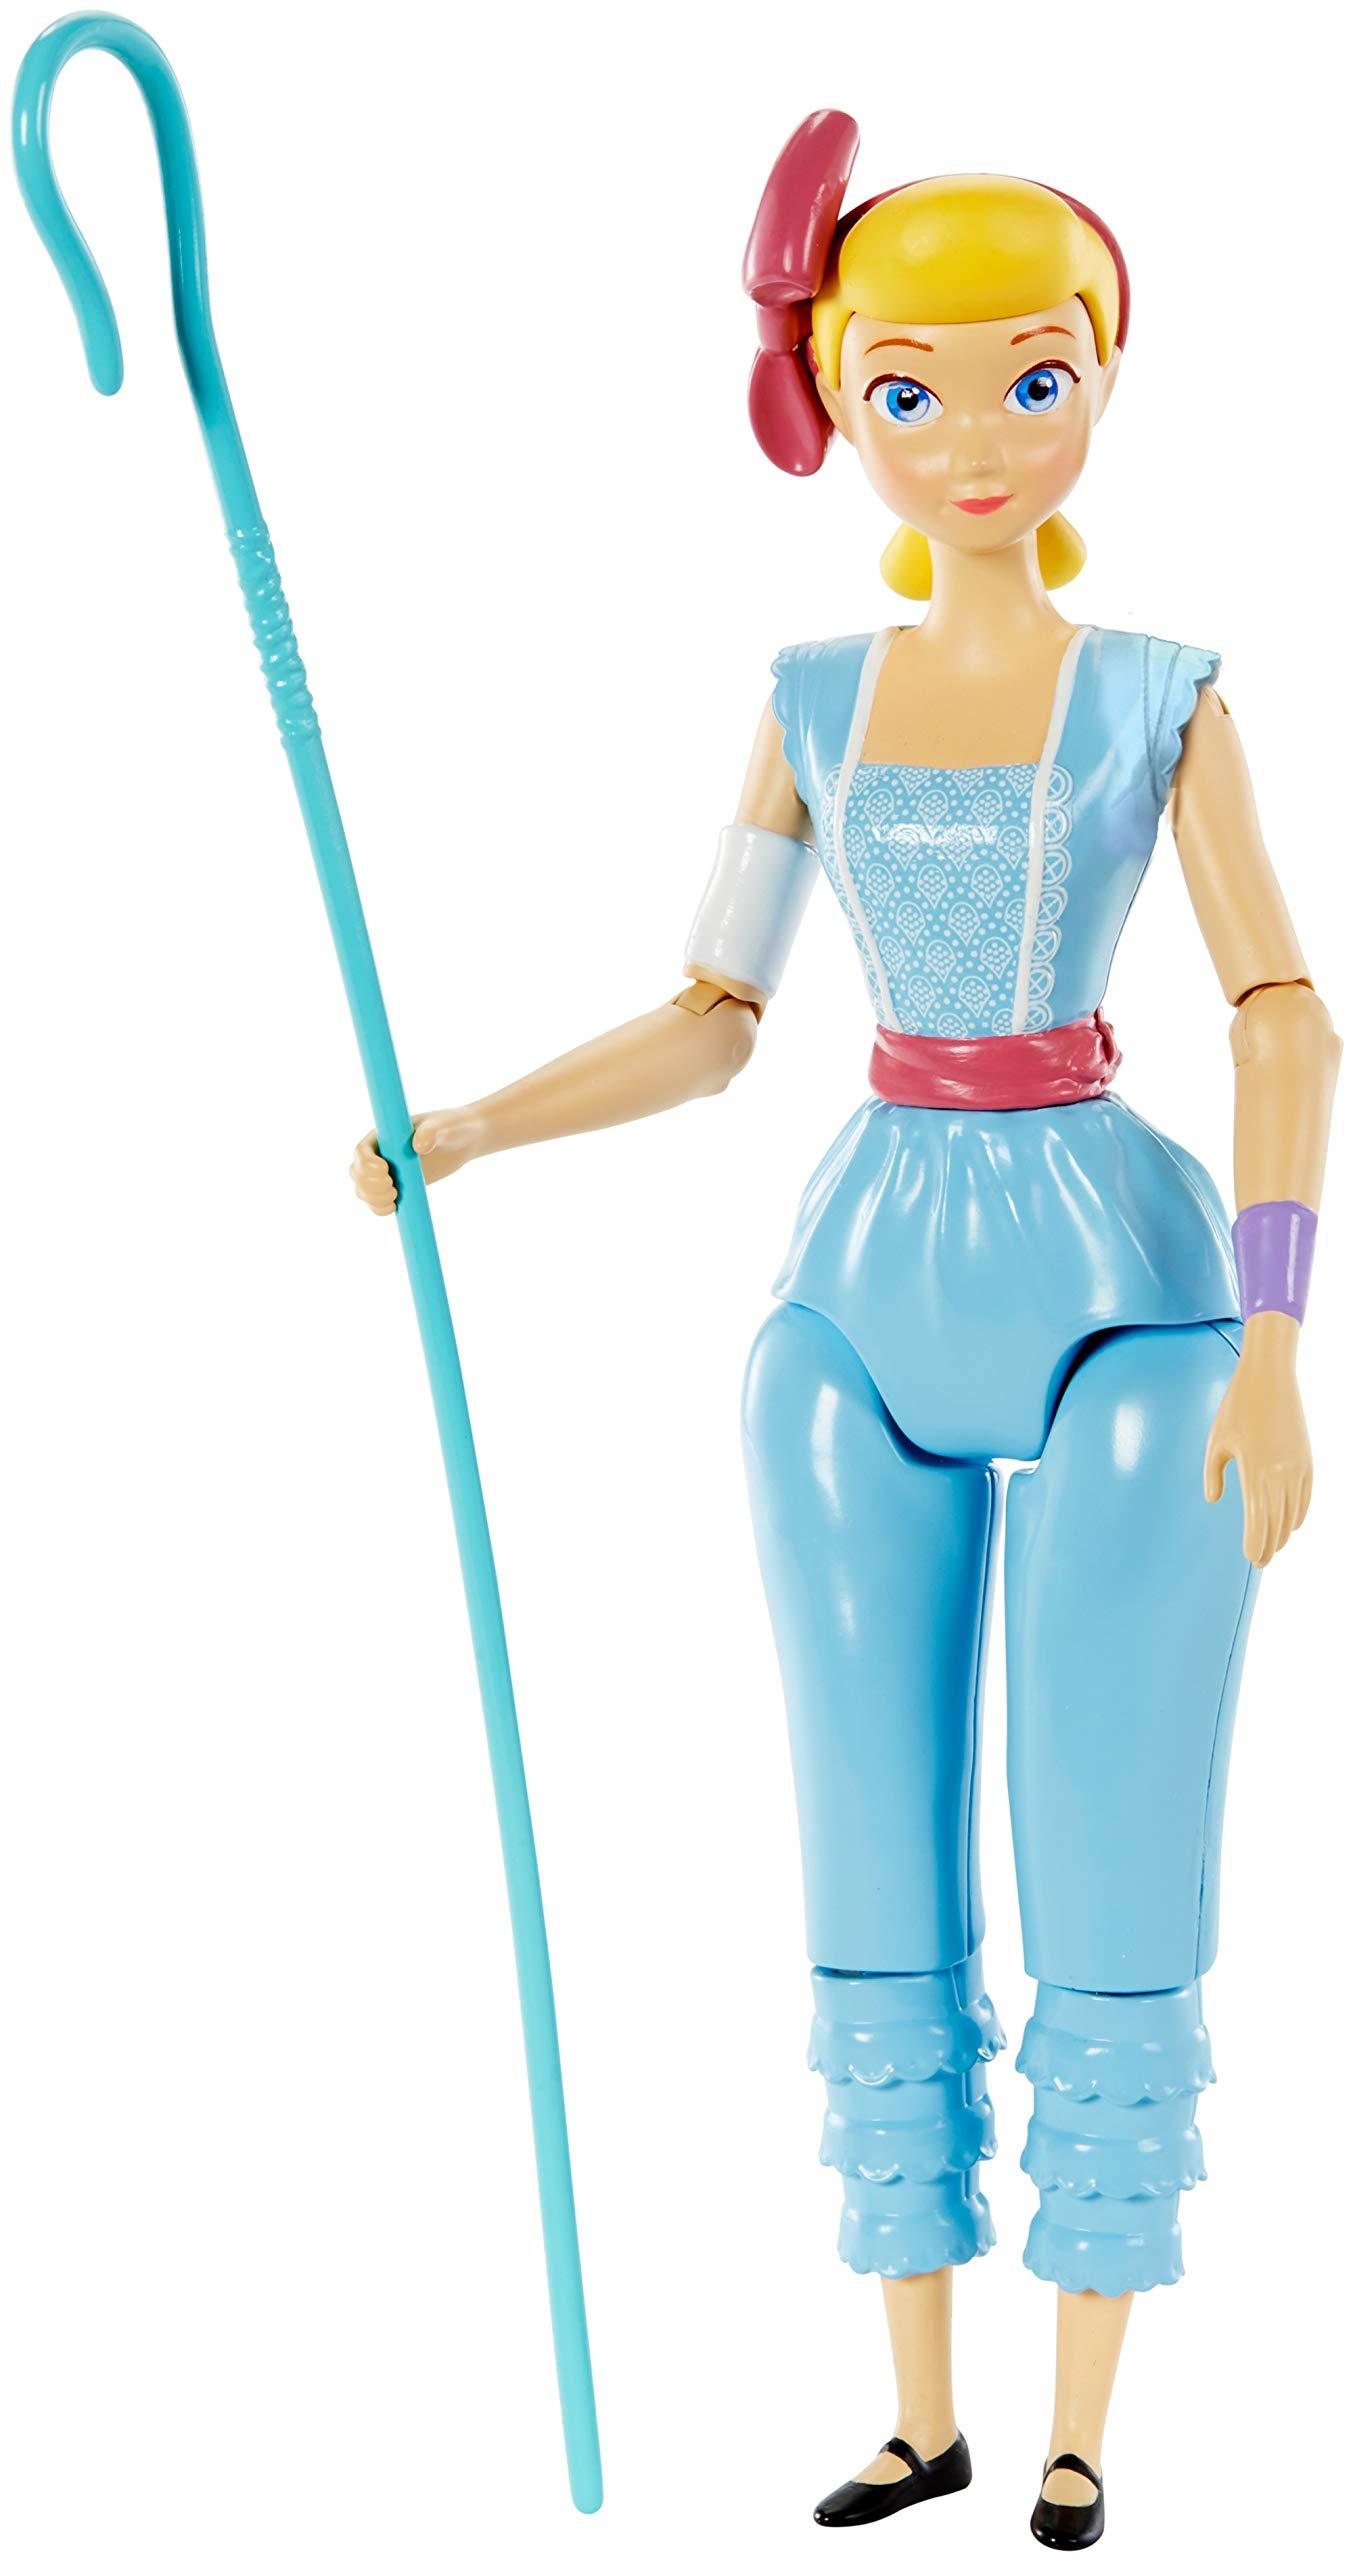 "ویکالا · خرید  اصل اورجینال · خرید از آمازون · Disney Pixar Toy Story Bo Peep Figure, 8.6"" wekala · ویکالا"